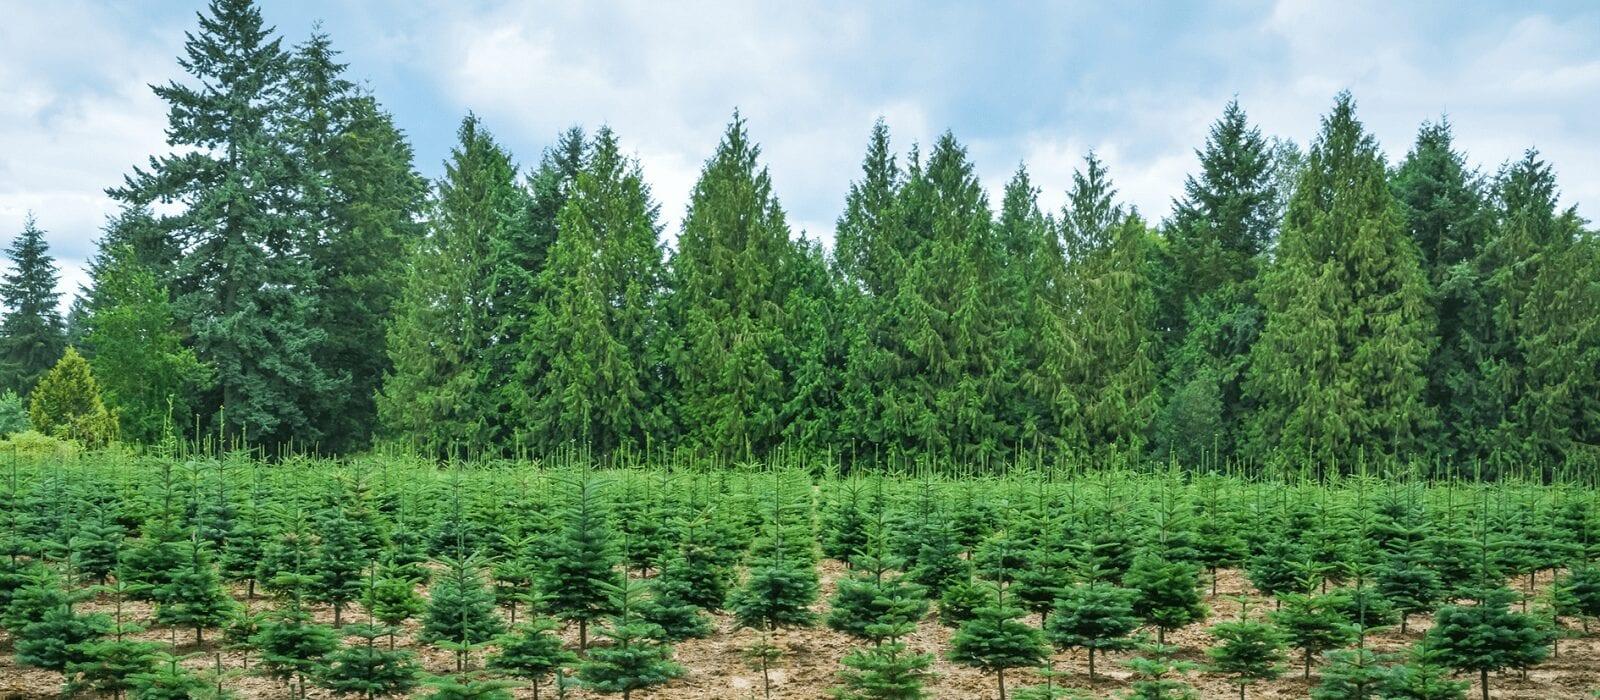 achmea-innovation-climate-forest